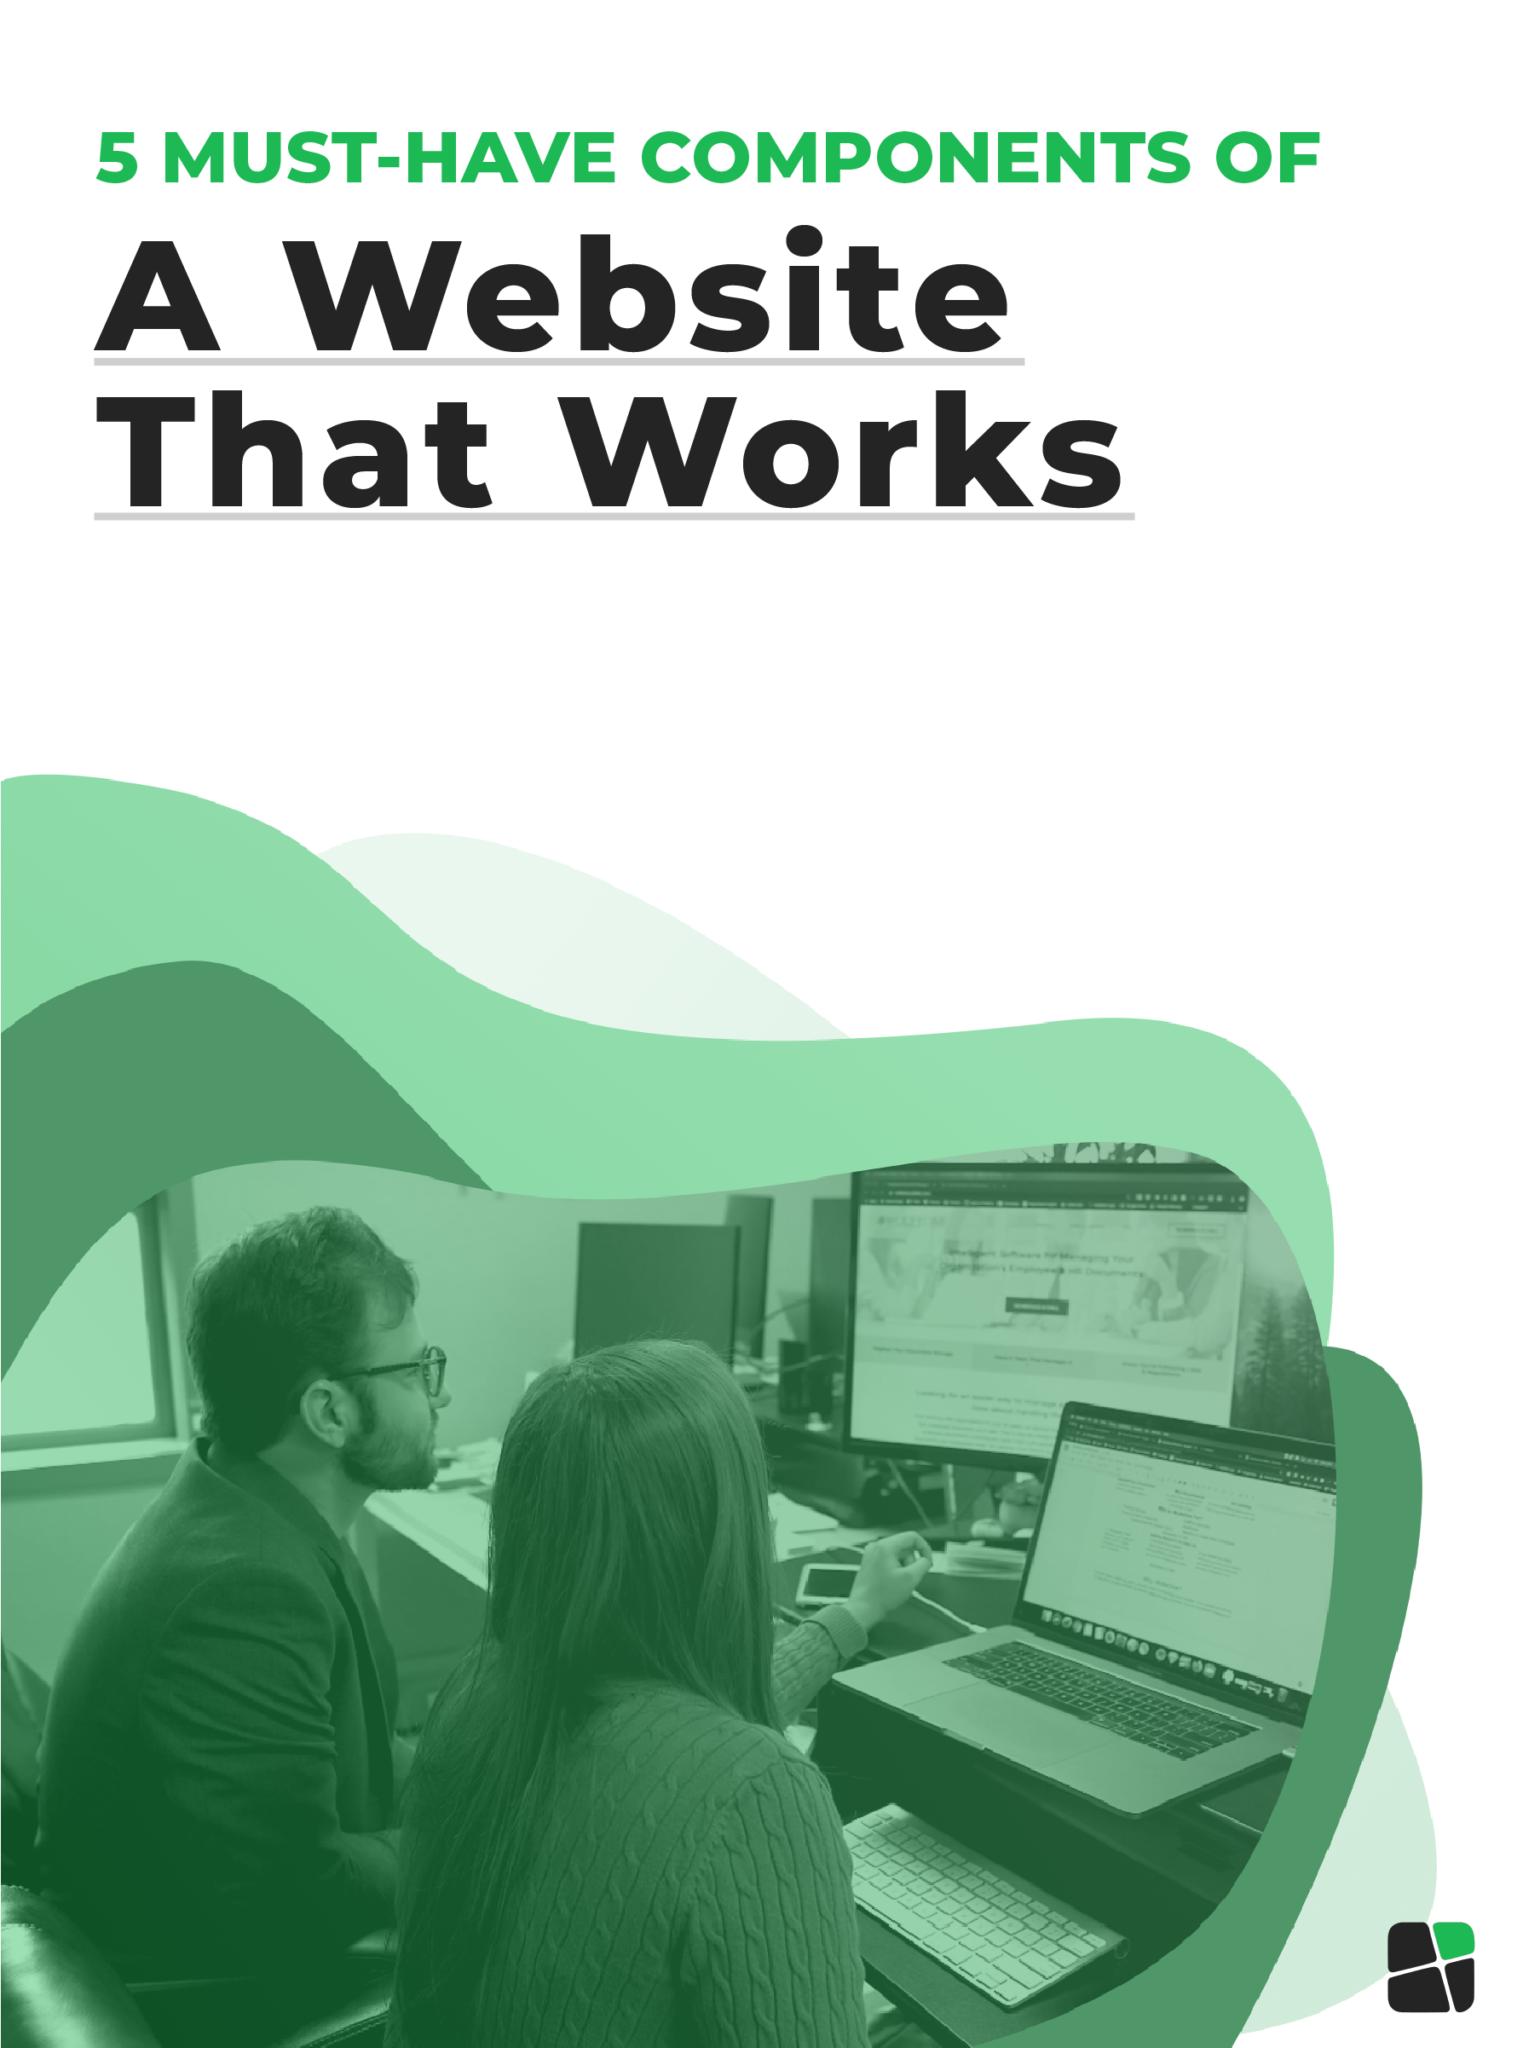 Website-That-Works_Ebook-Cover_Greenstone-Media@3x